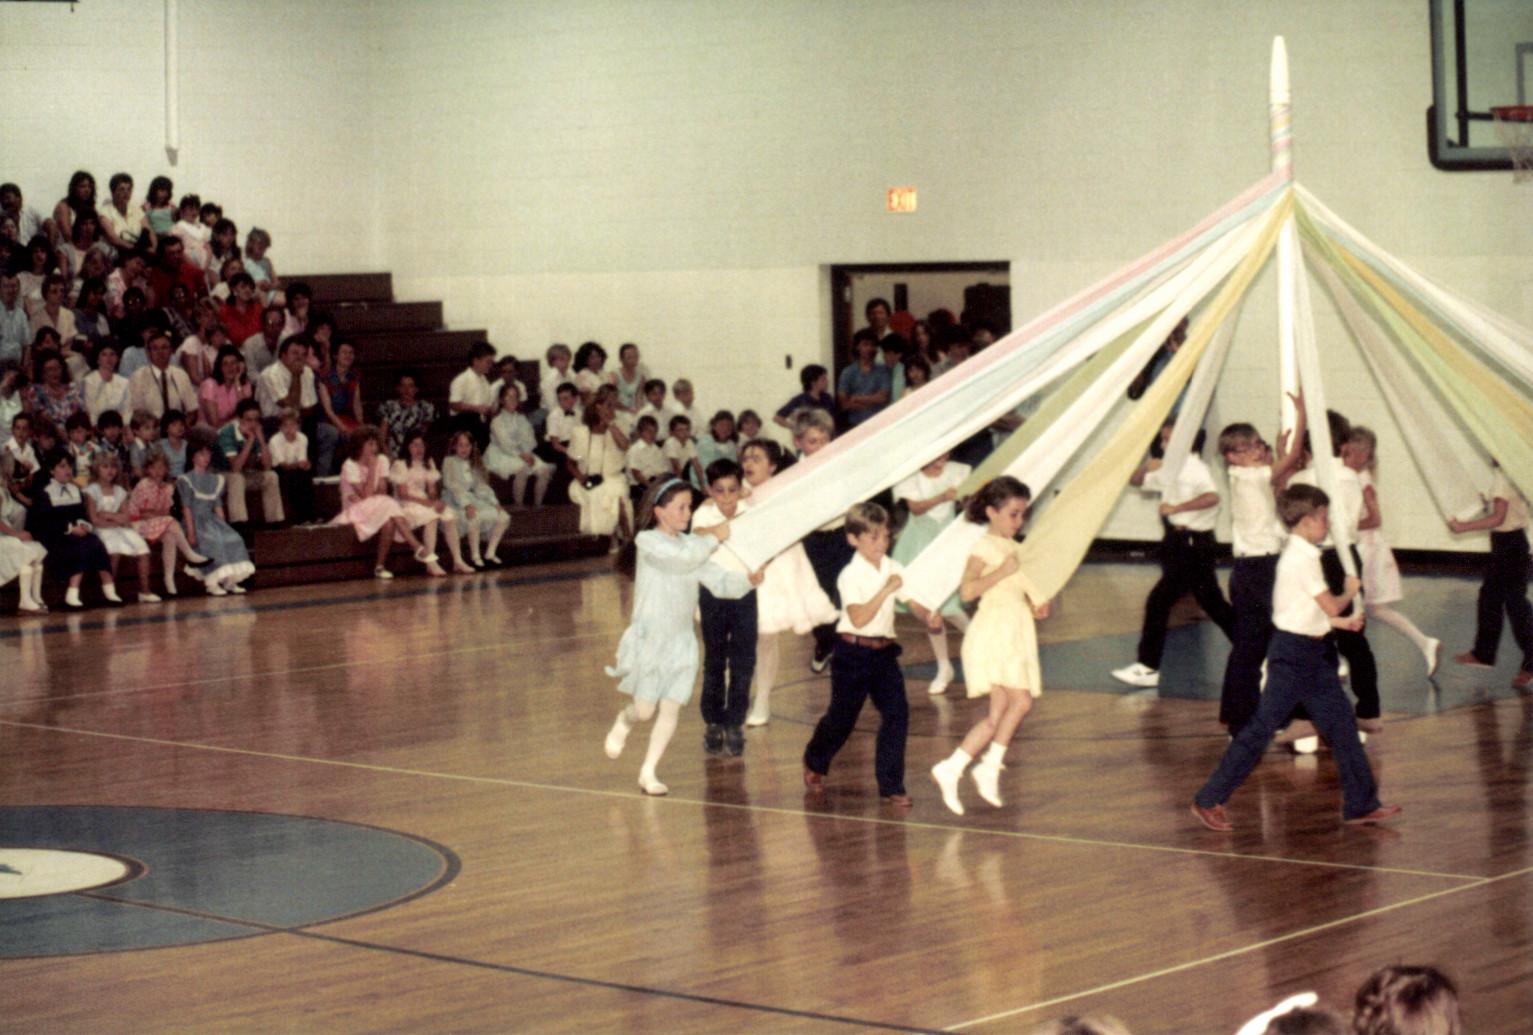 The Maypole Dance